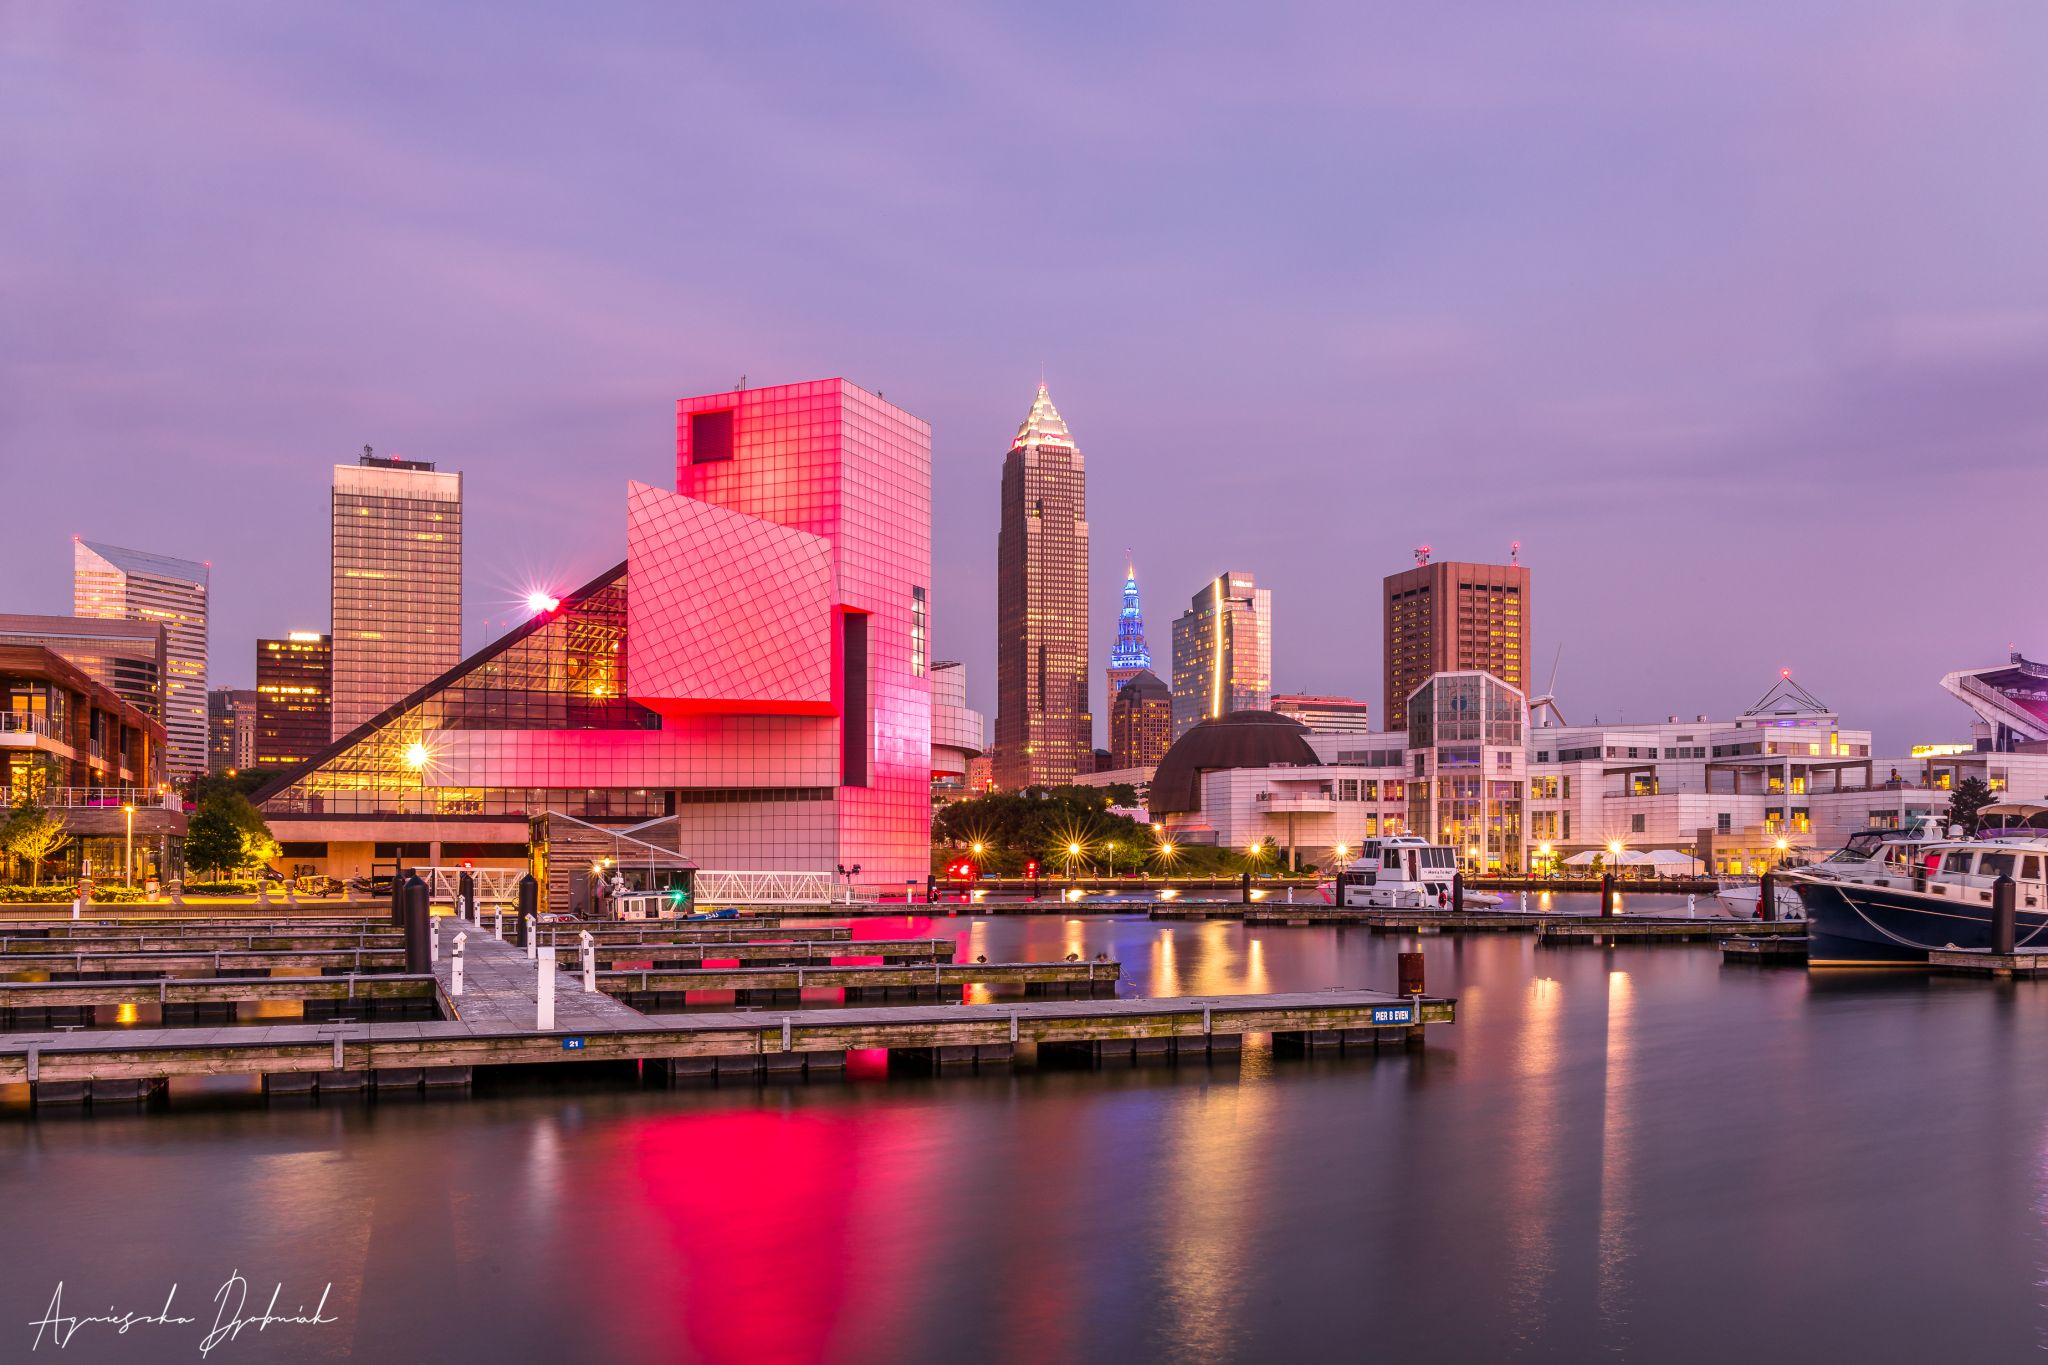 Cleveland North Coast Harbor, USA